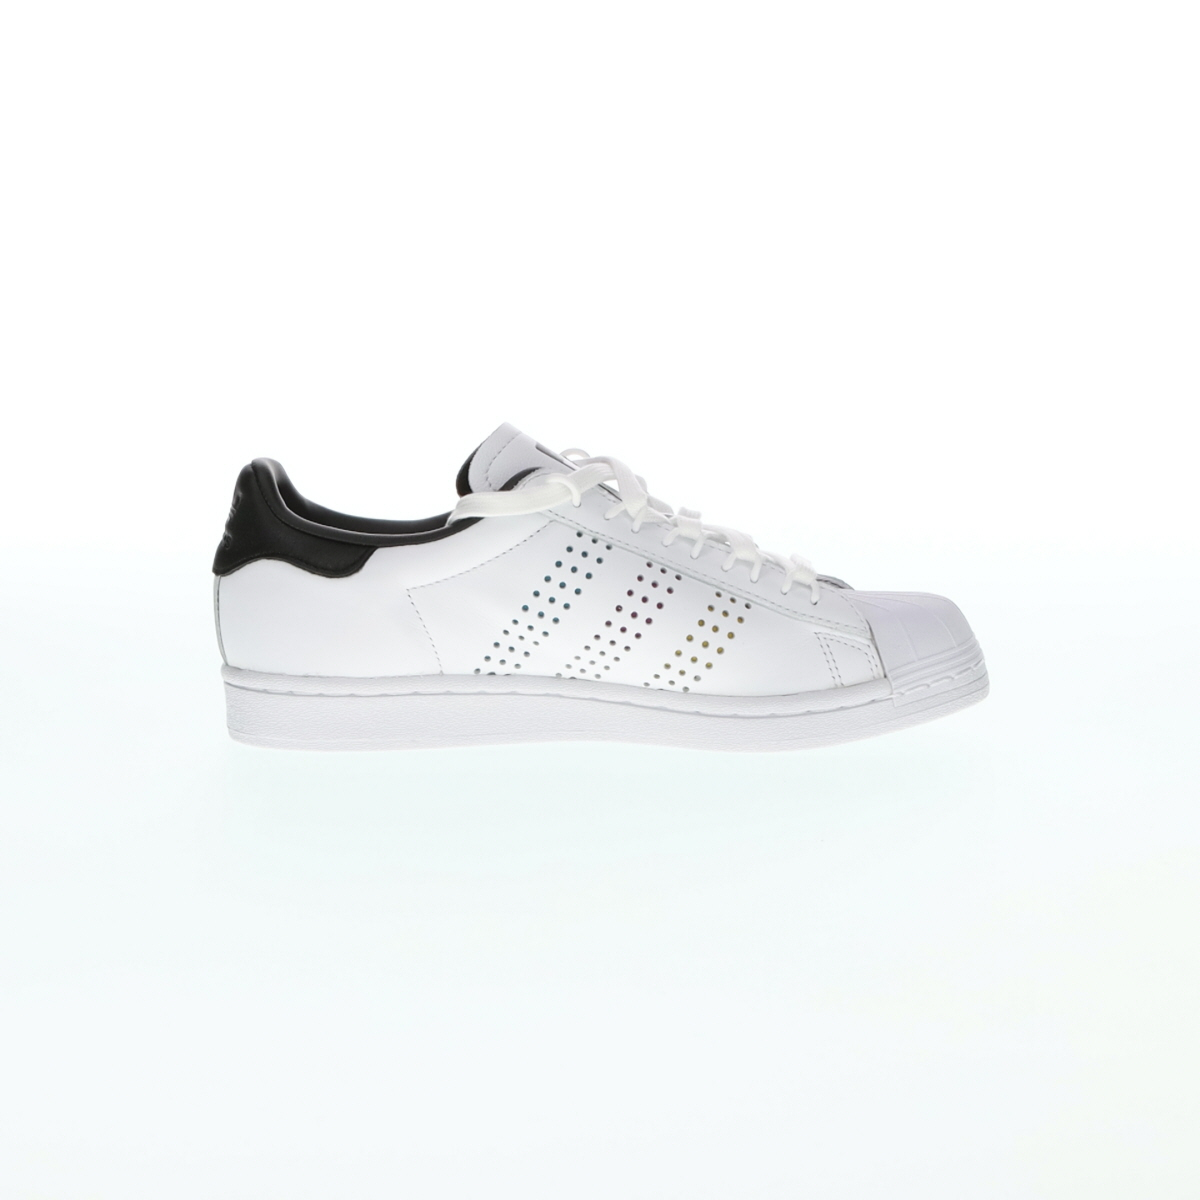 adidas tubular shadows beige gray color